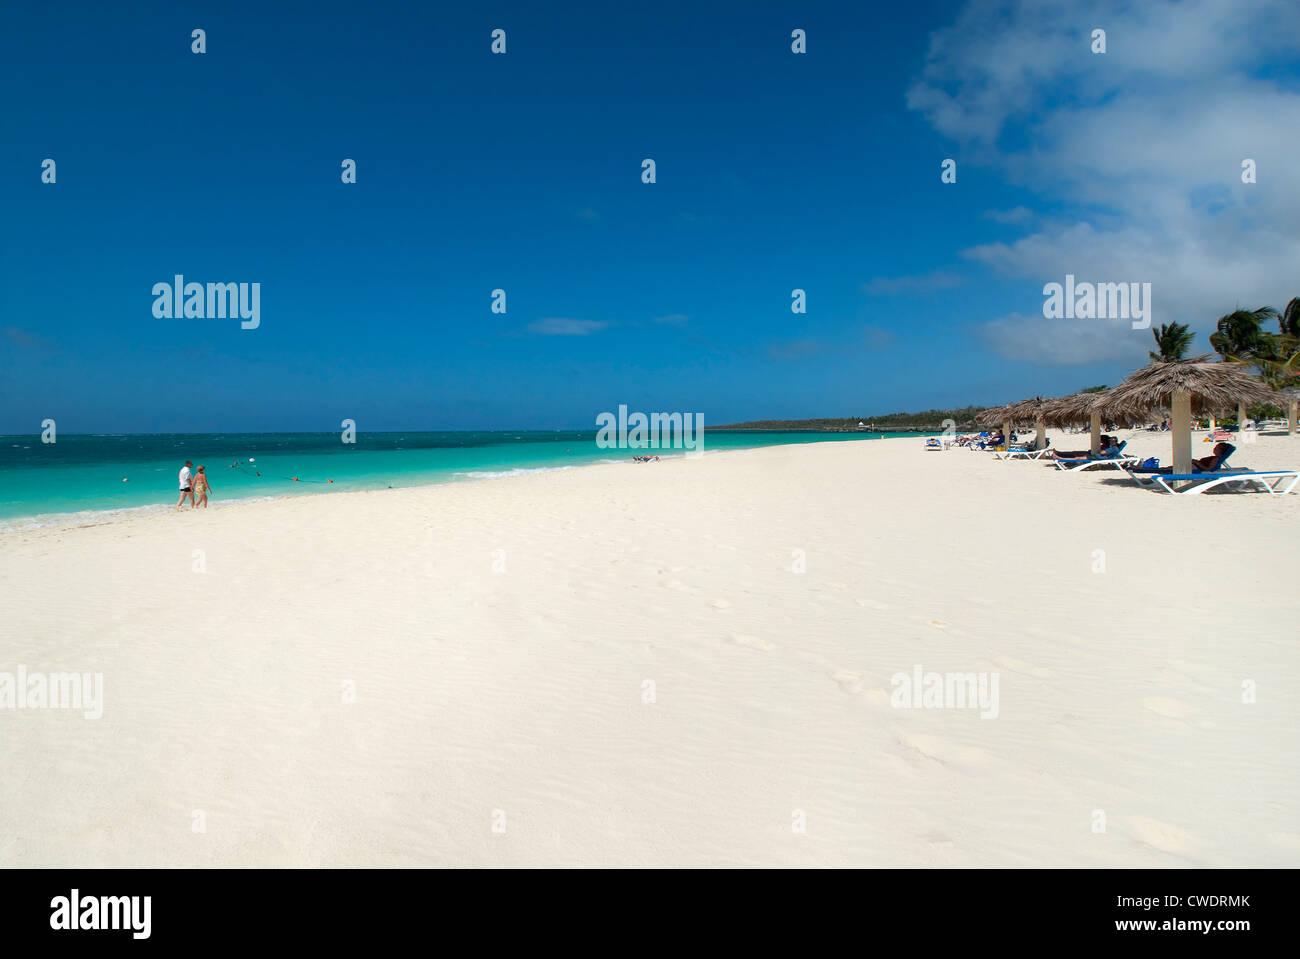 Beach near Hotel Sol Rio de Luna & Mares, Guardalavaca, Holguin, Cuba - Stock Image